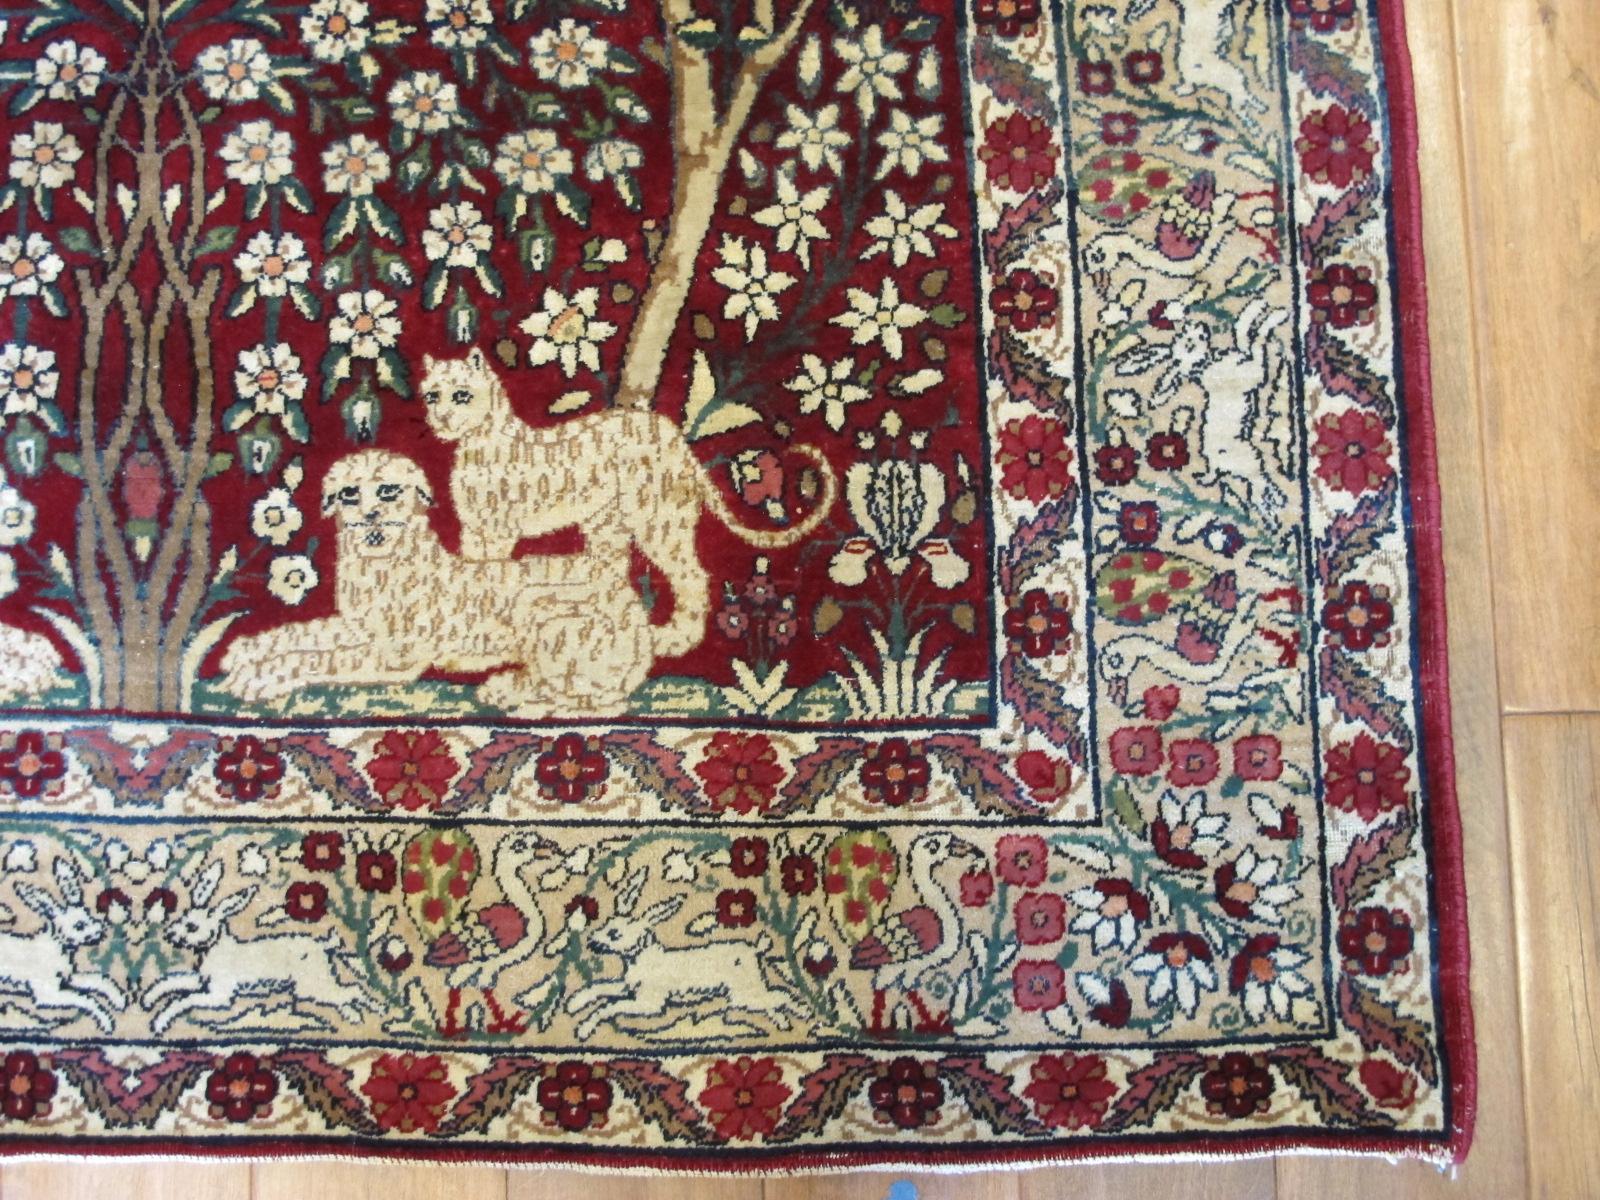 21427 antique persian kerman laver rug 4,6 x 6,4 (3)